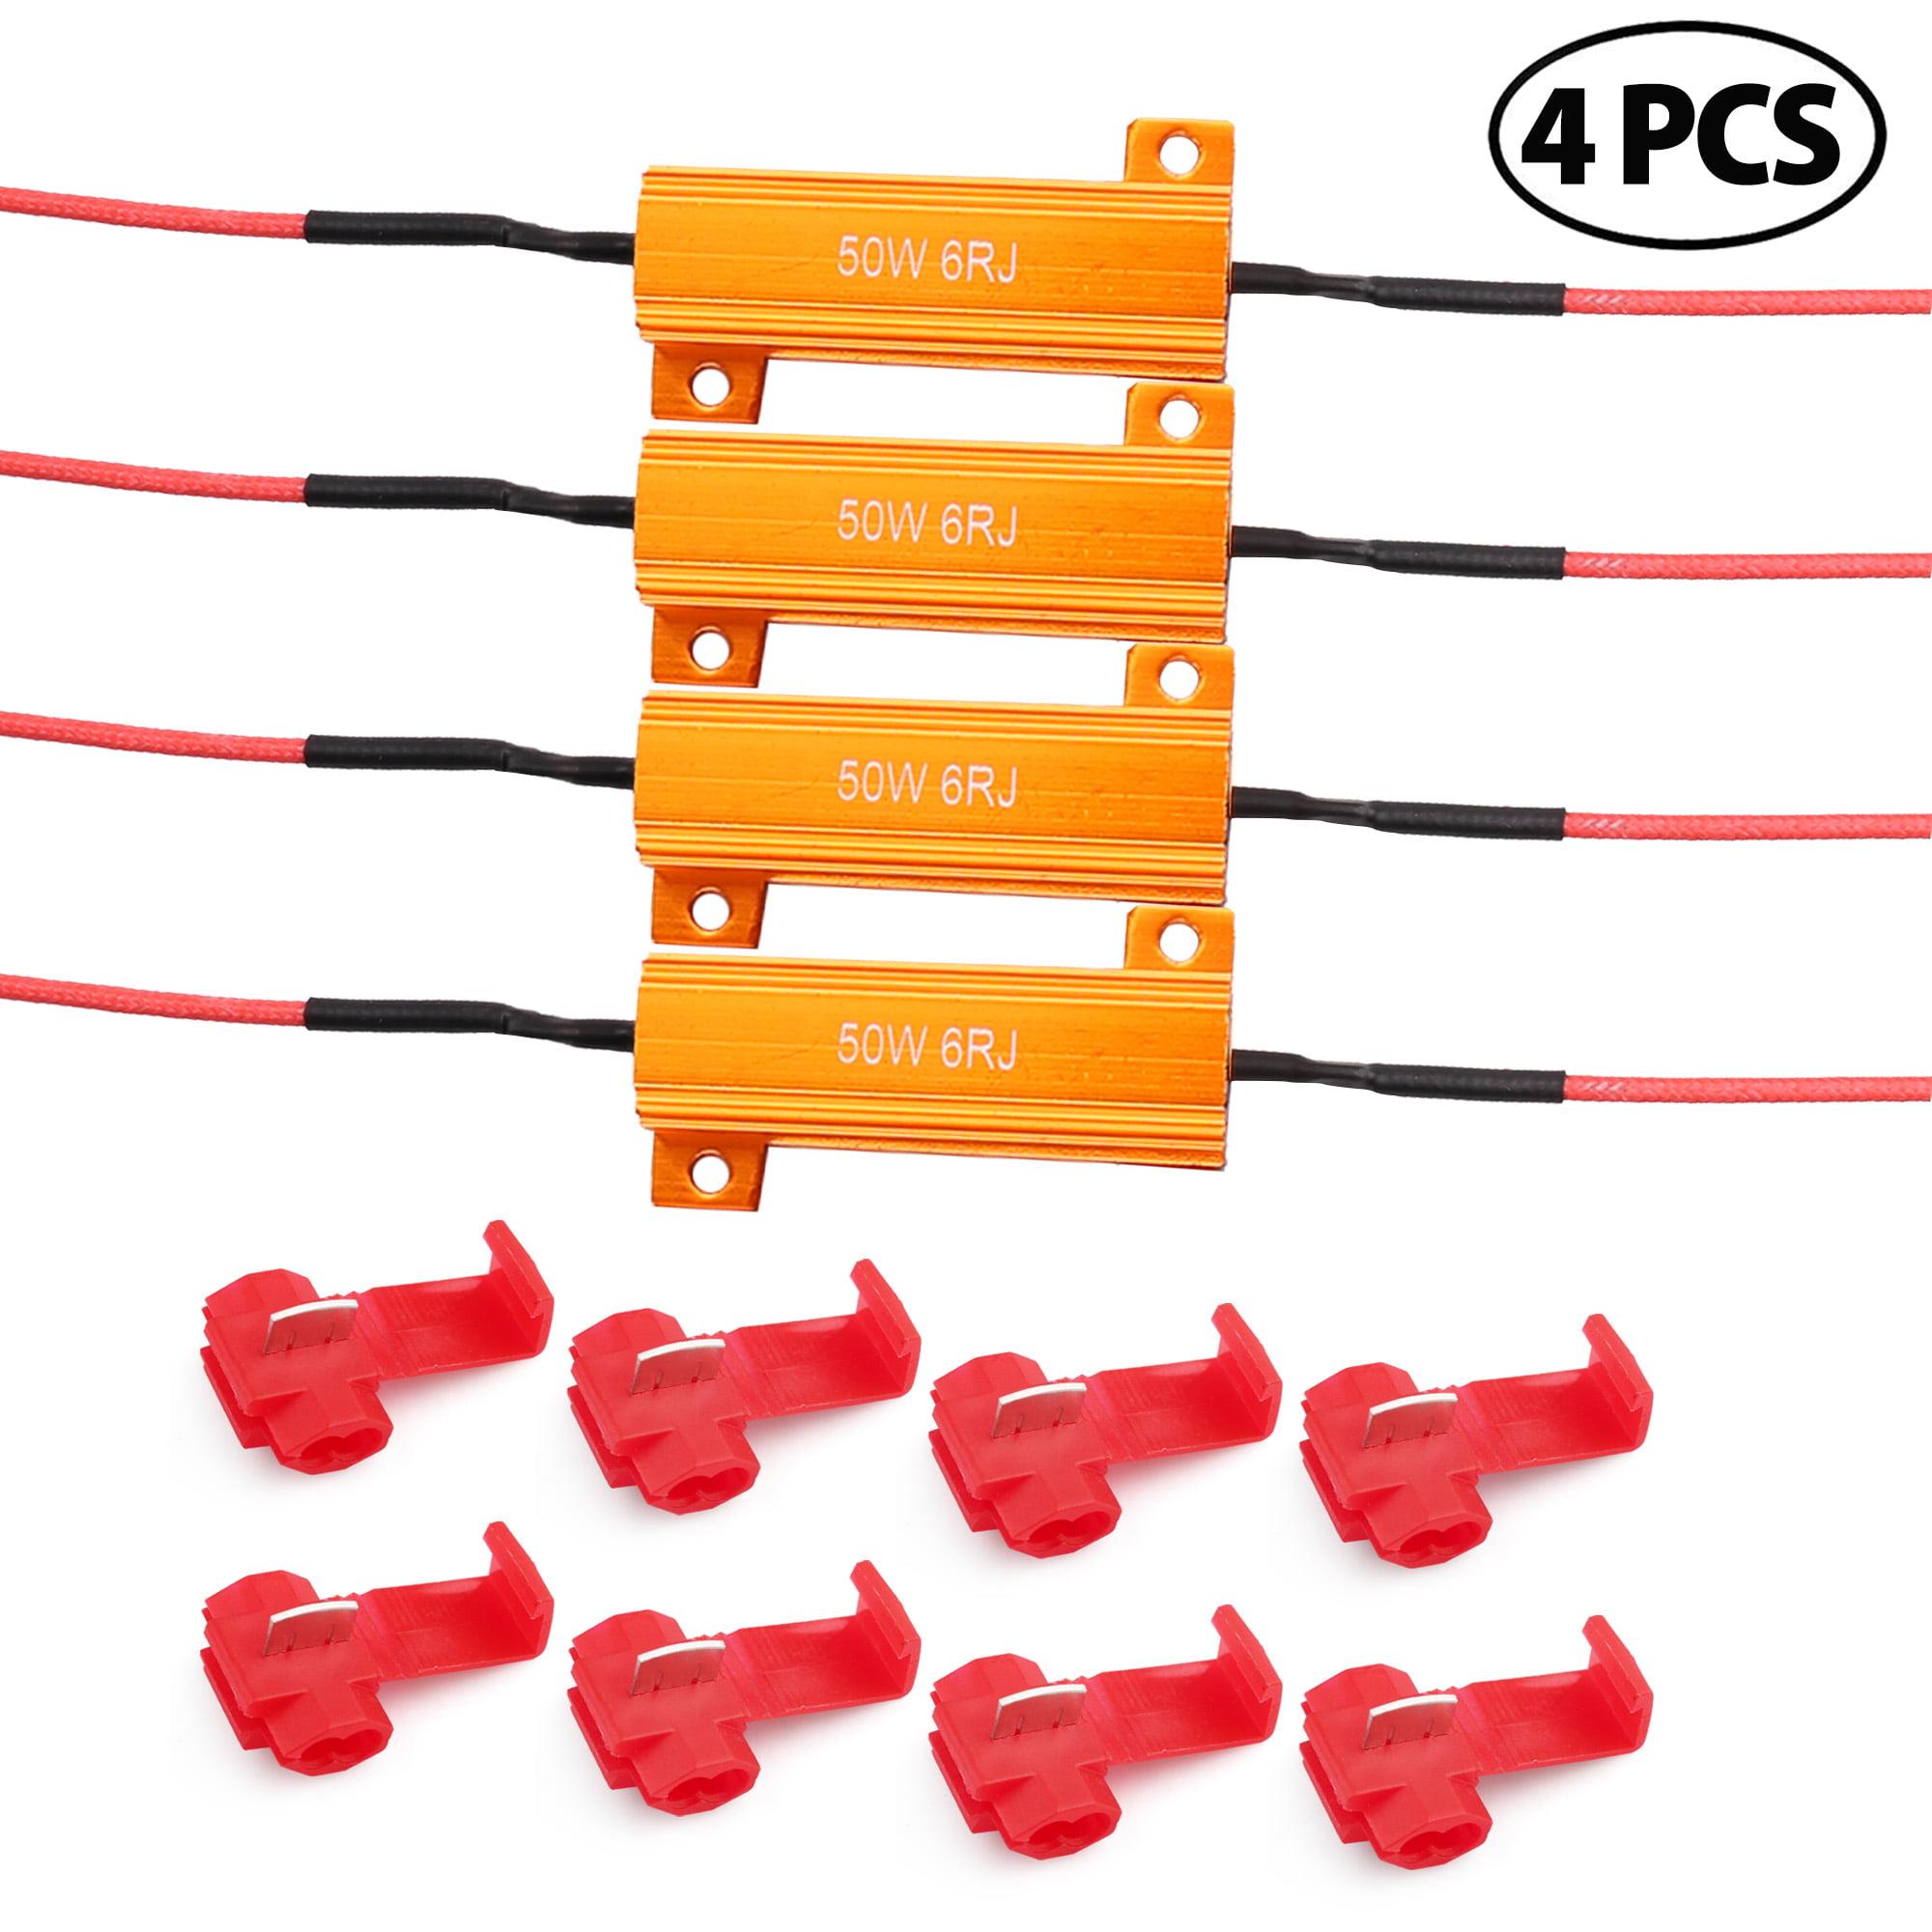 8PCS 50W 6ohm LED Load Resistors Load Resistors for Flickering LED Turn Signal Light /& LED License Plate Lights /& DRL